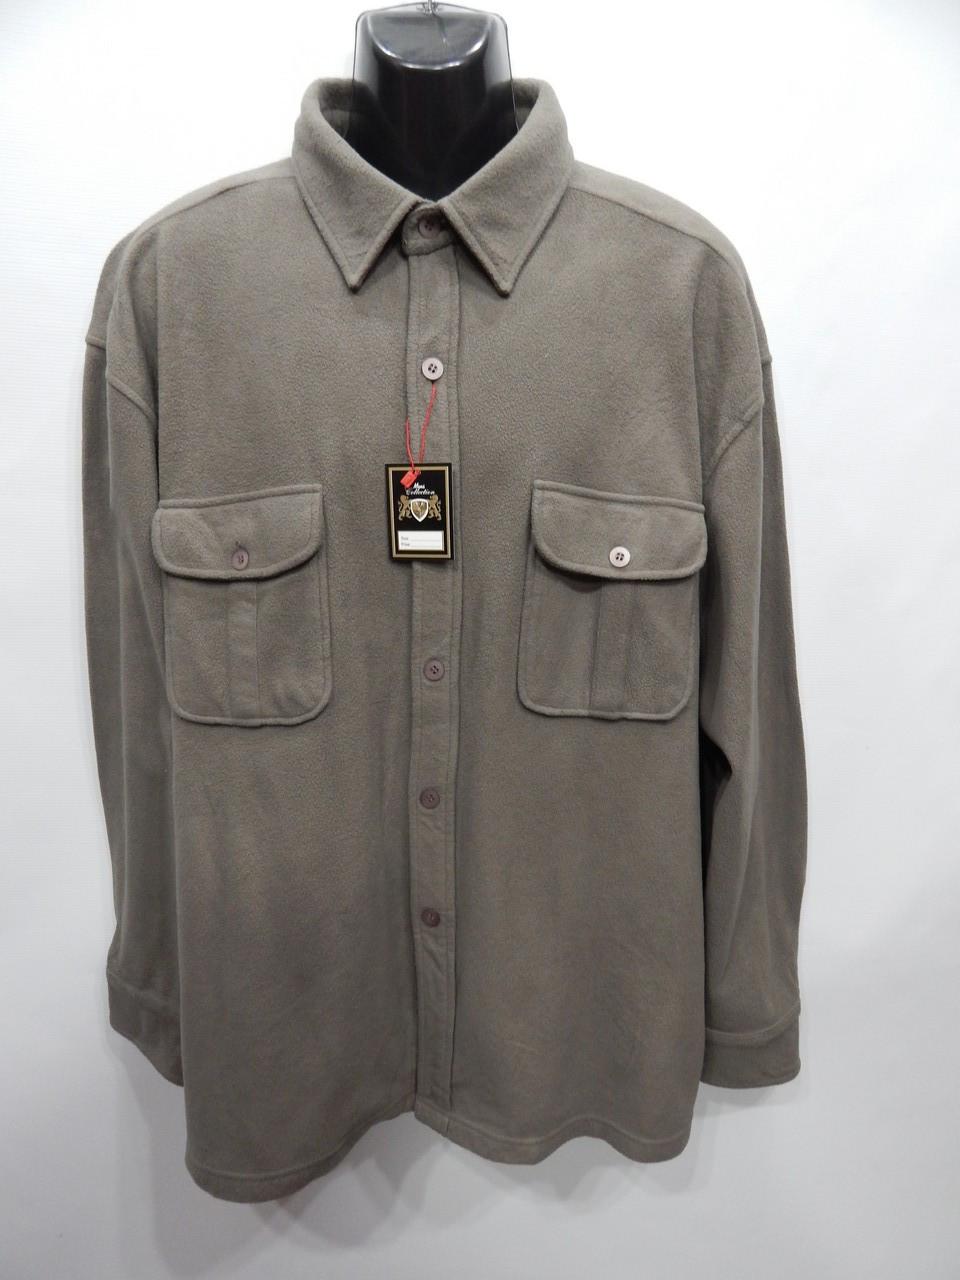 Мужская теплая флисовая рубашка Joes Outdoors оригинал р.58-60 065RT (батал)